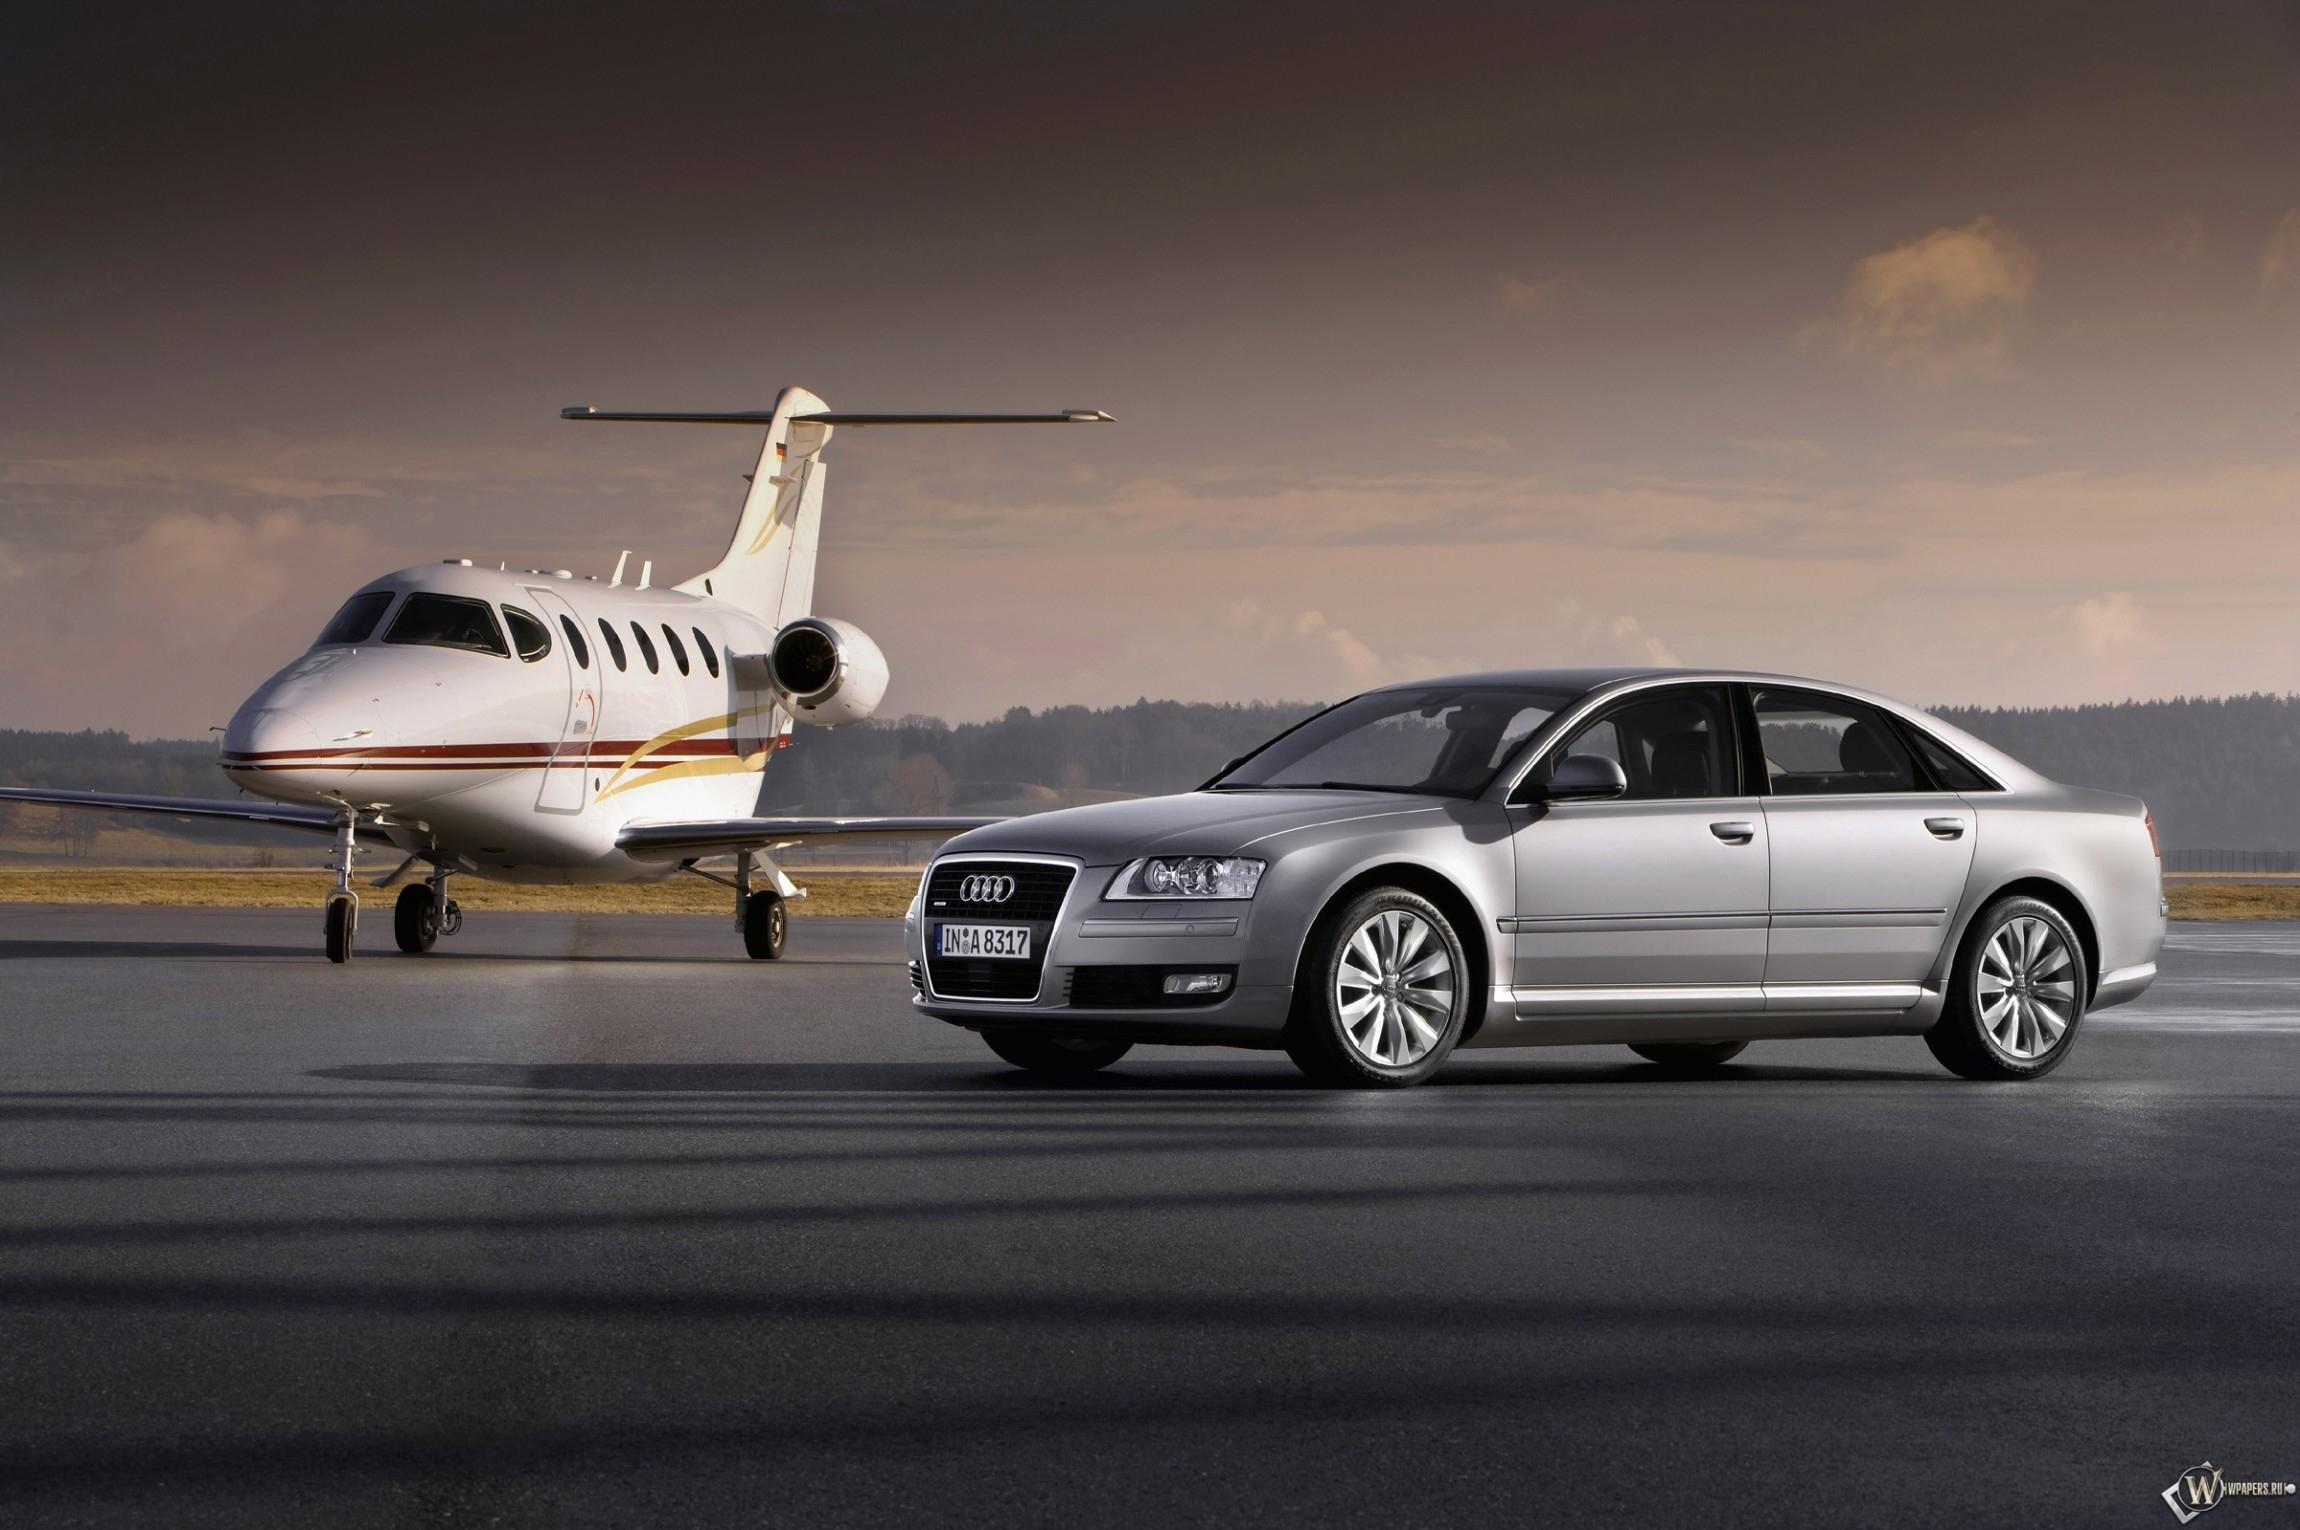 Audi A8 (2008) 2300x1530